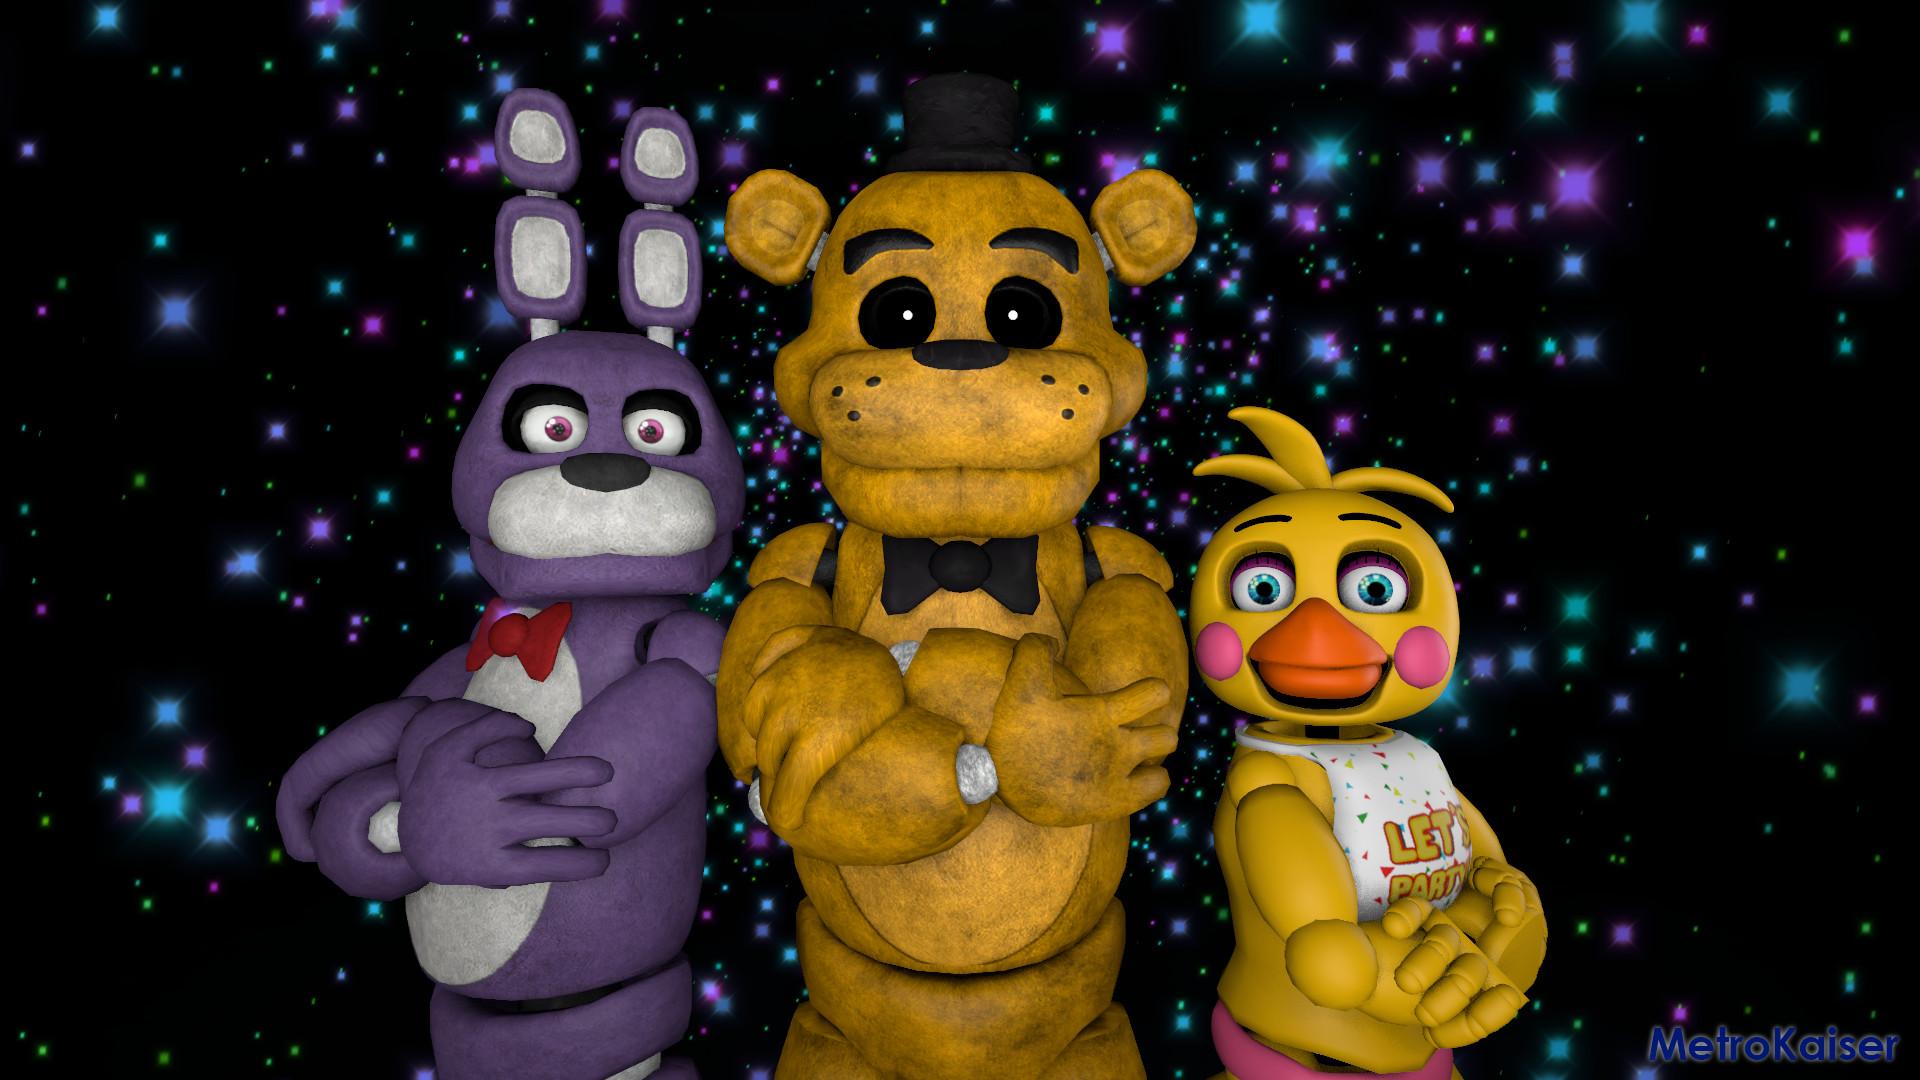 … FNAF] Bonnie, Golden Freddy and Toy Chica by wstmetro